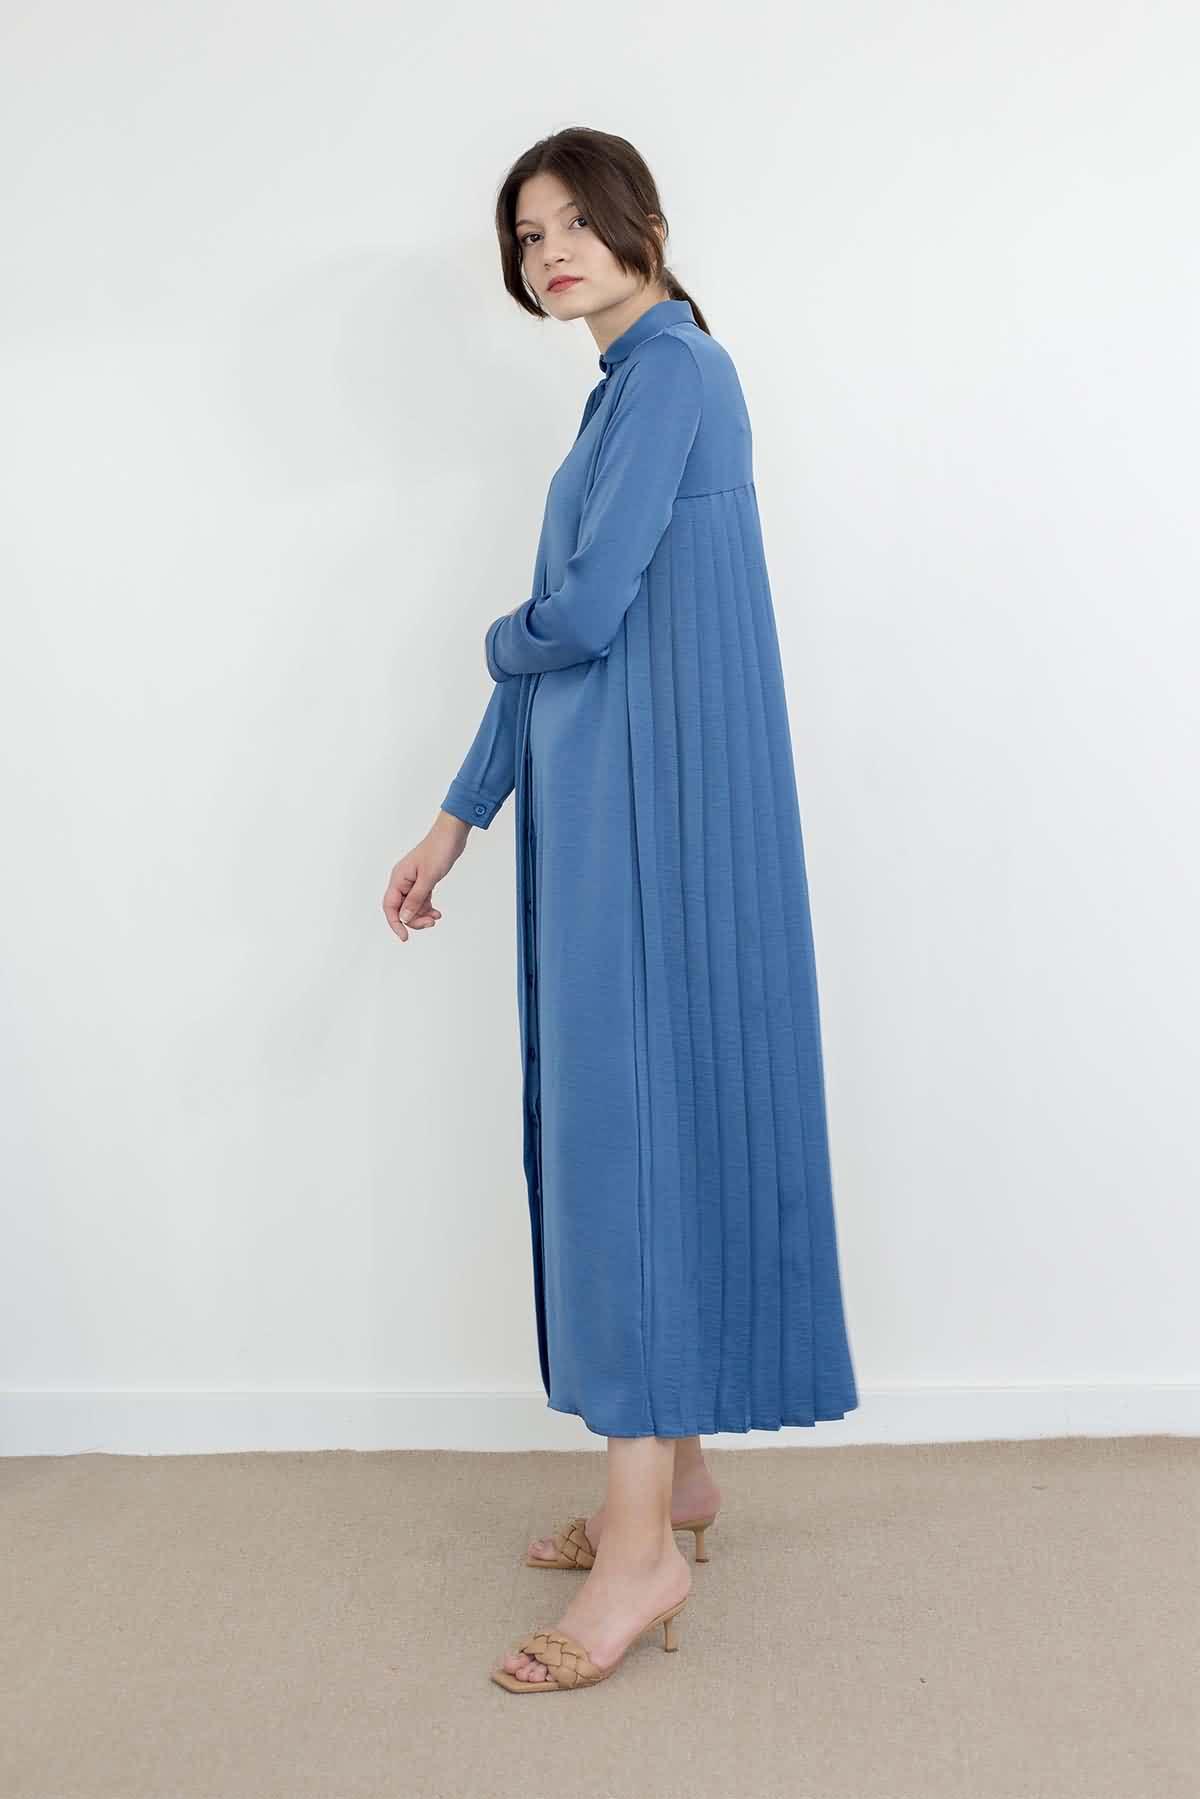 Mevra - Piliseli Elbise İndigo